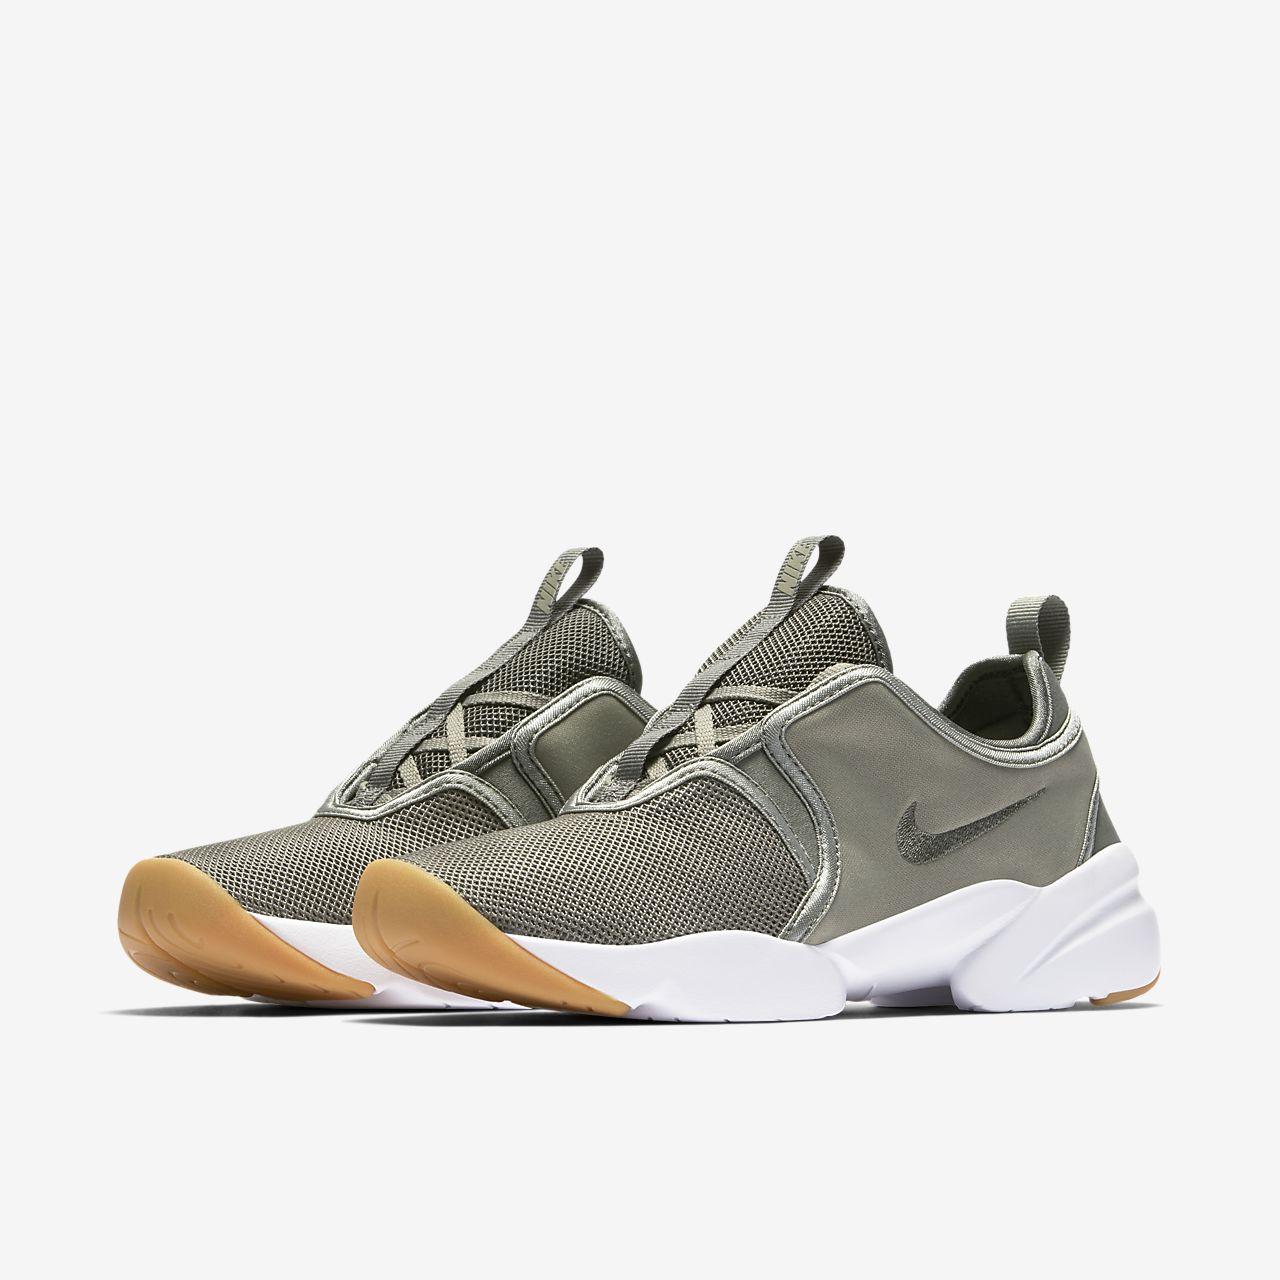 Ashin Modernes Chaussures Nike Rose W Vb86PcKd